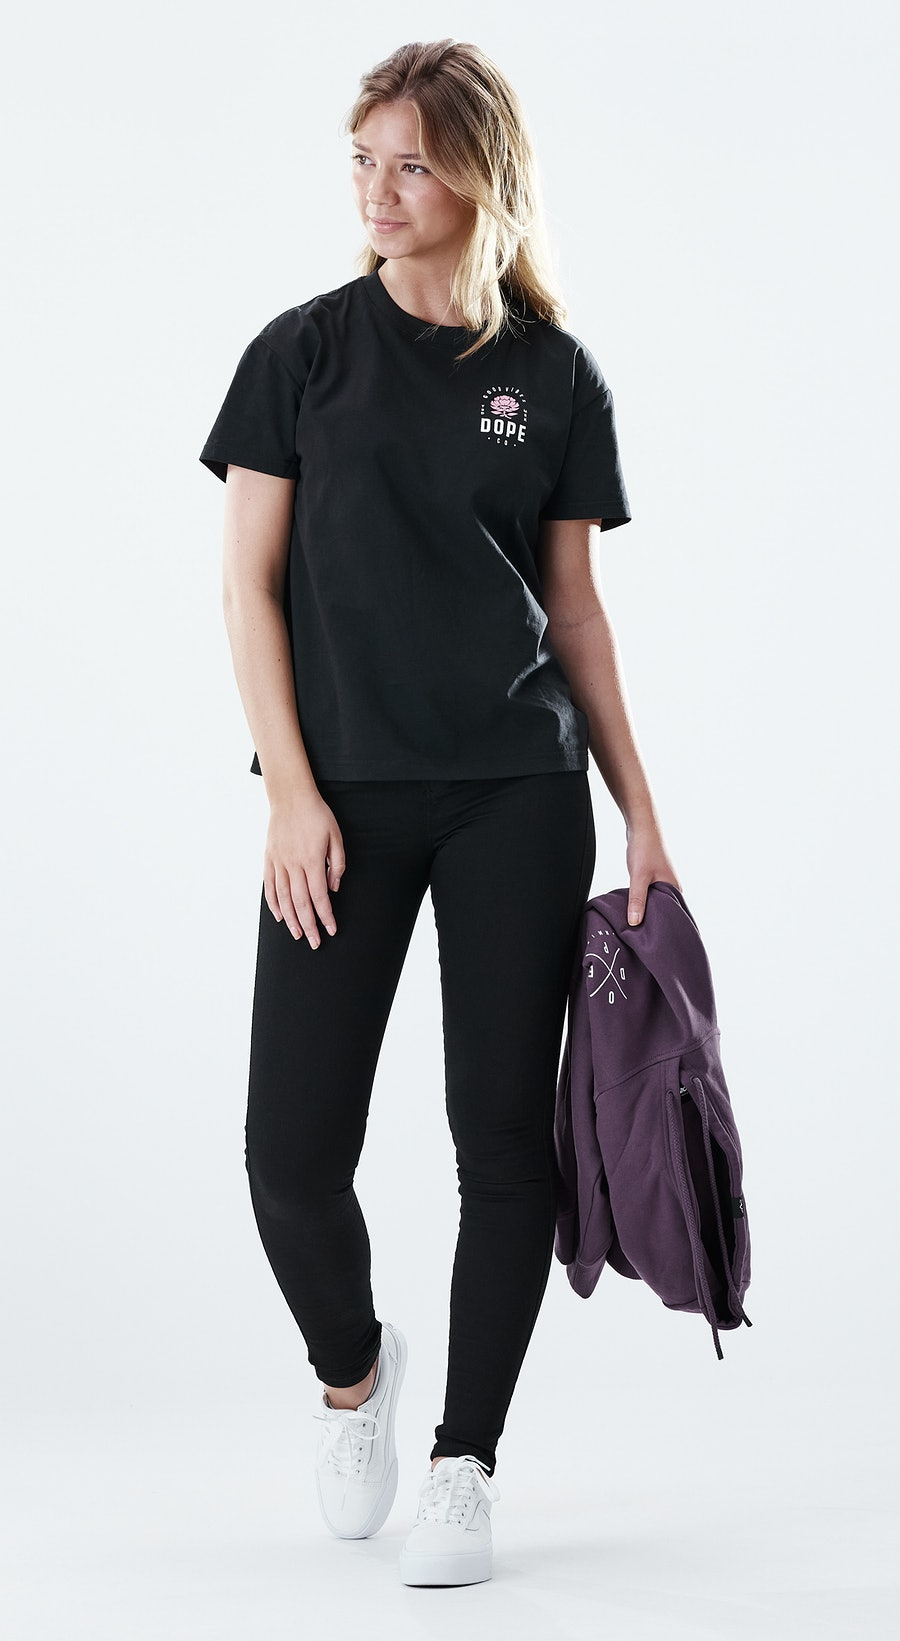 Dope Regular Rose Black Outfit Multi